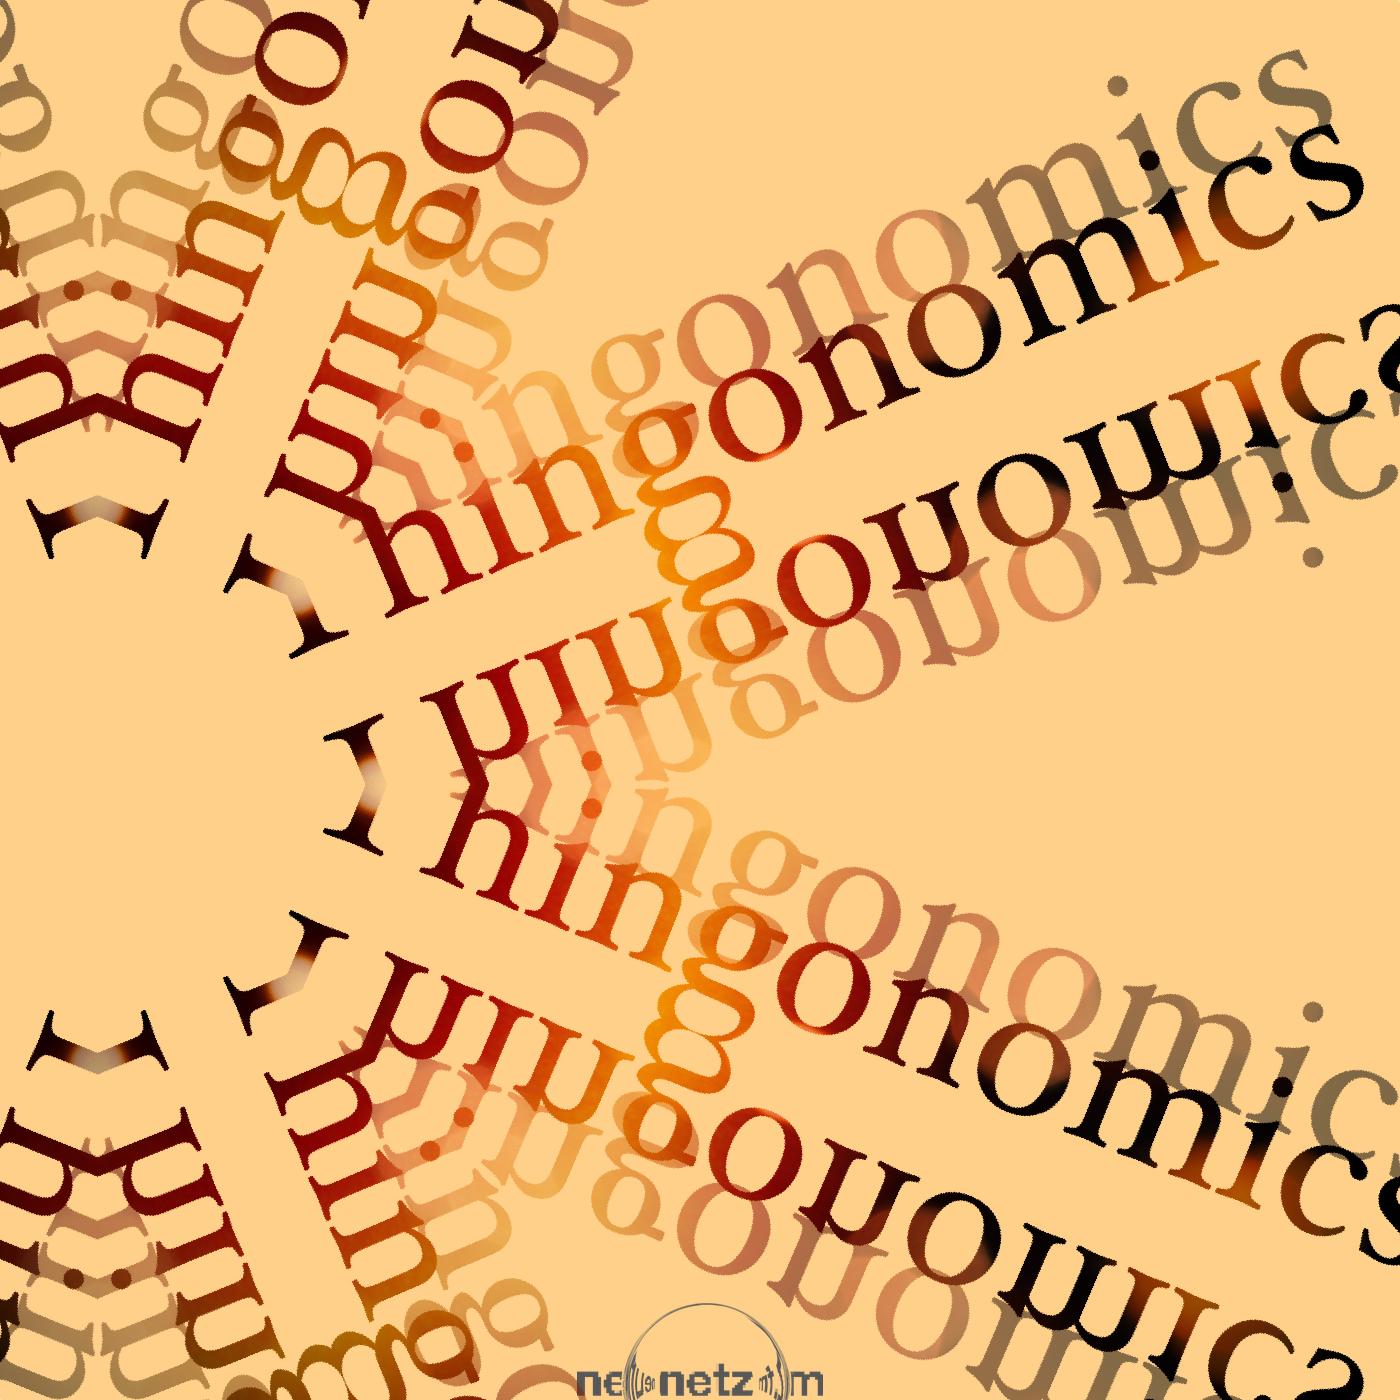 Logo von Thingonomics